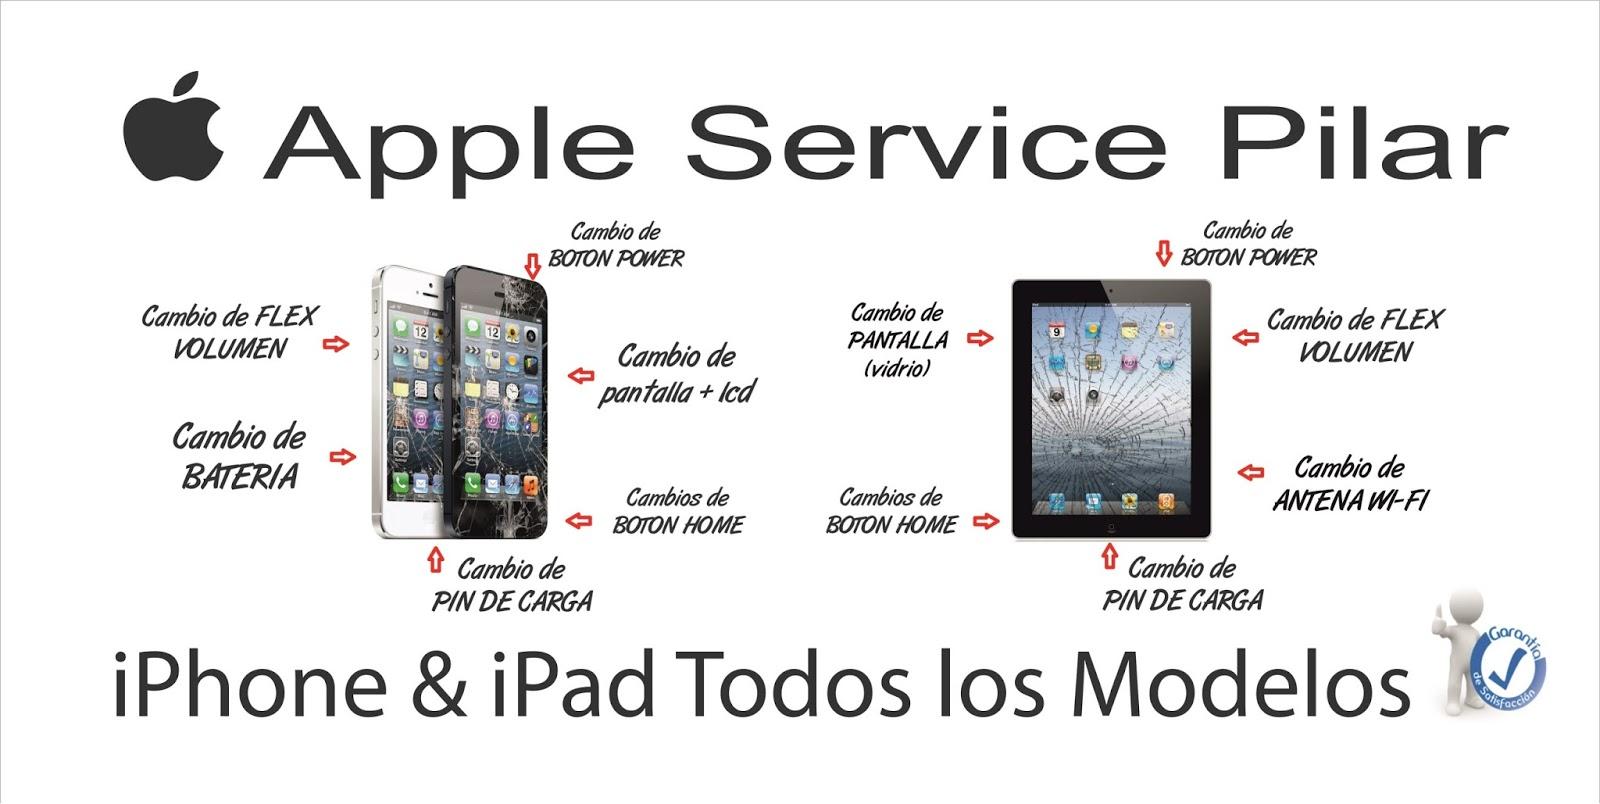 Apple Service Pilar: iPhone Service Pilar